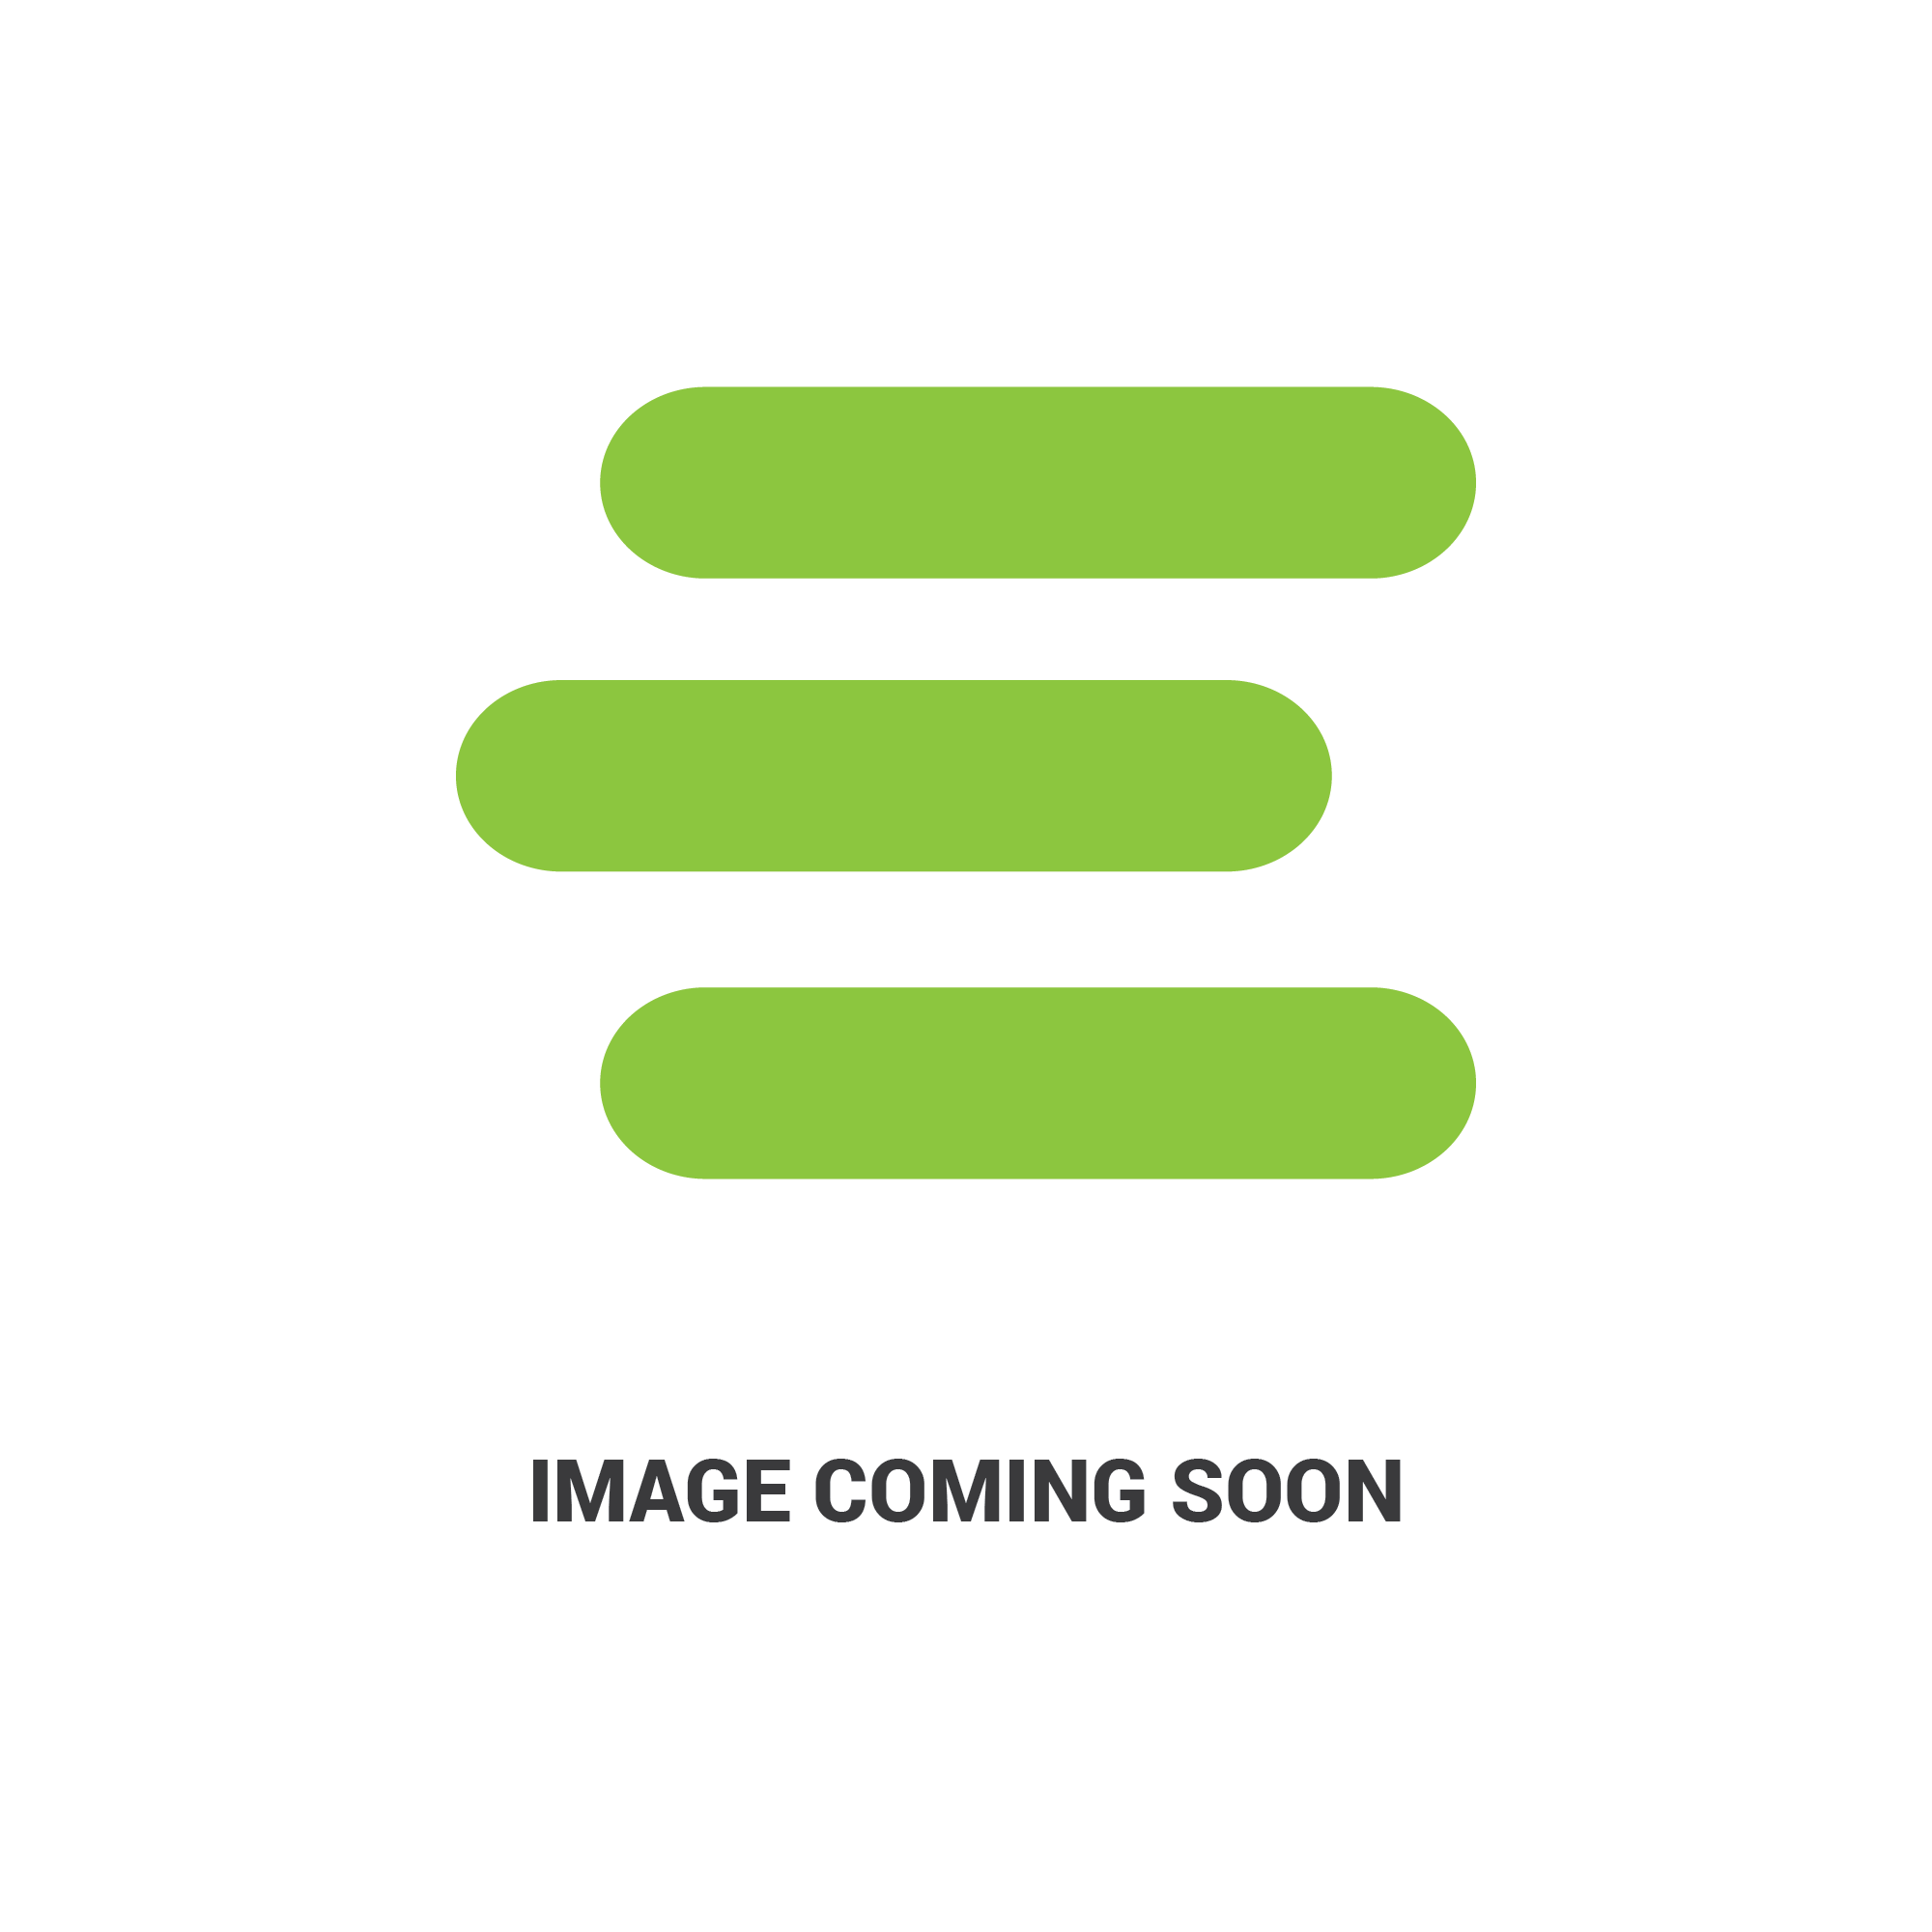 E-16032-51013edit 3.jpg